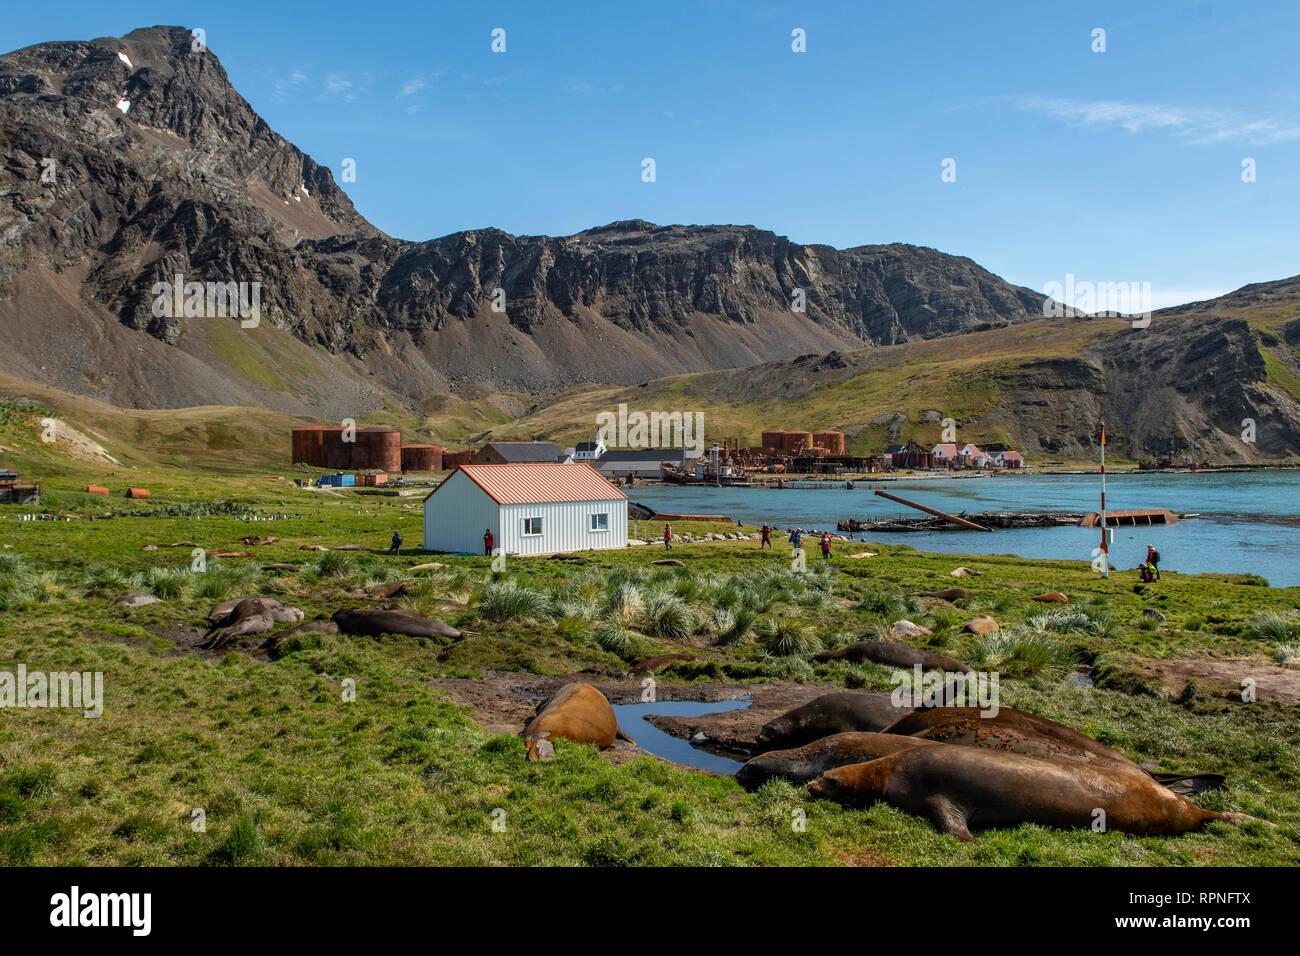 Whaling Station, Grytviken, South Georgia - Stock Image